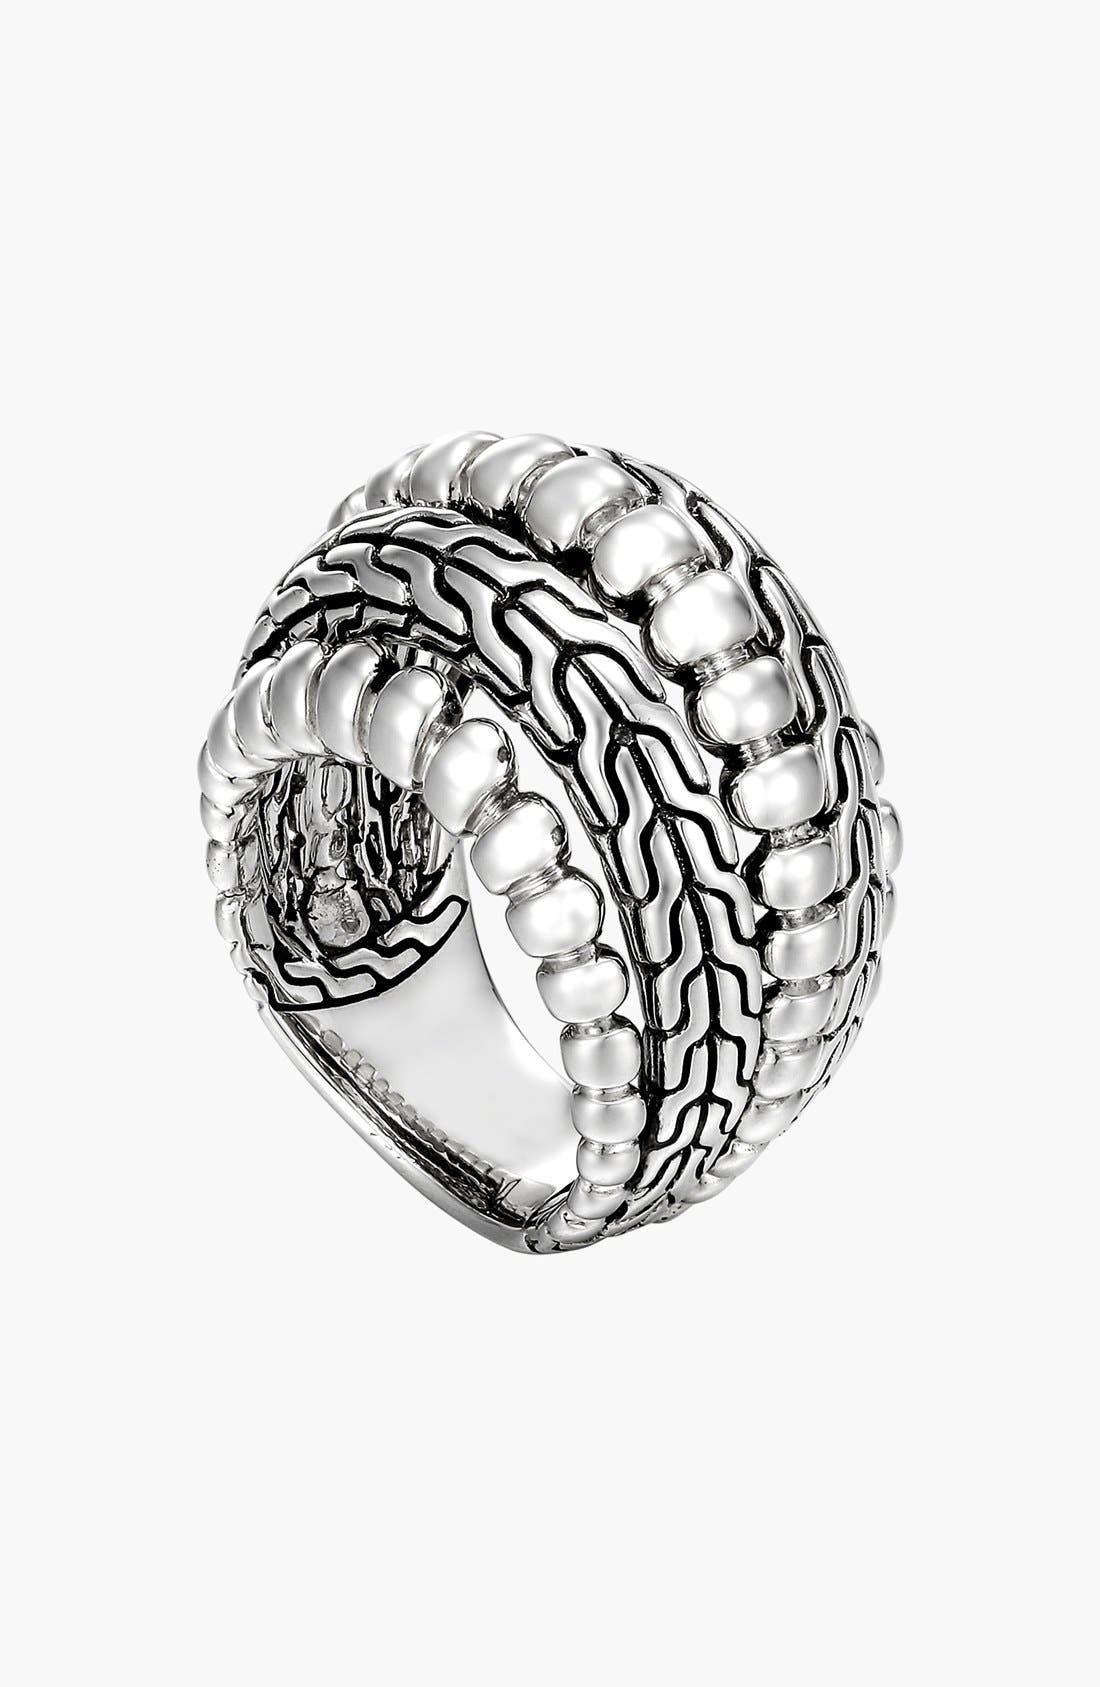 Main Image - John Hardy 'Classic Chain' Dome Ring